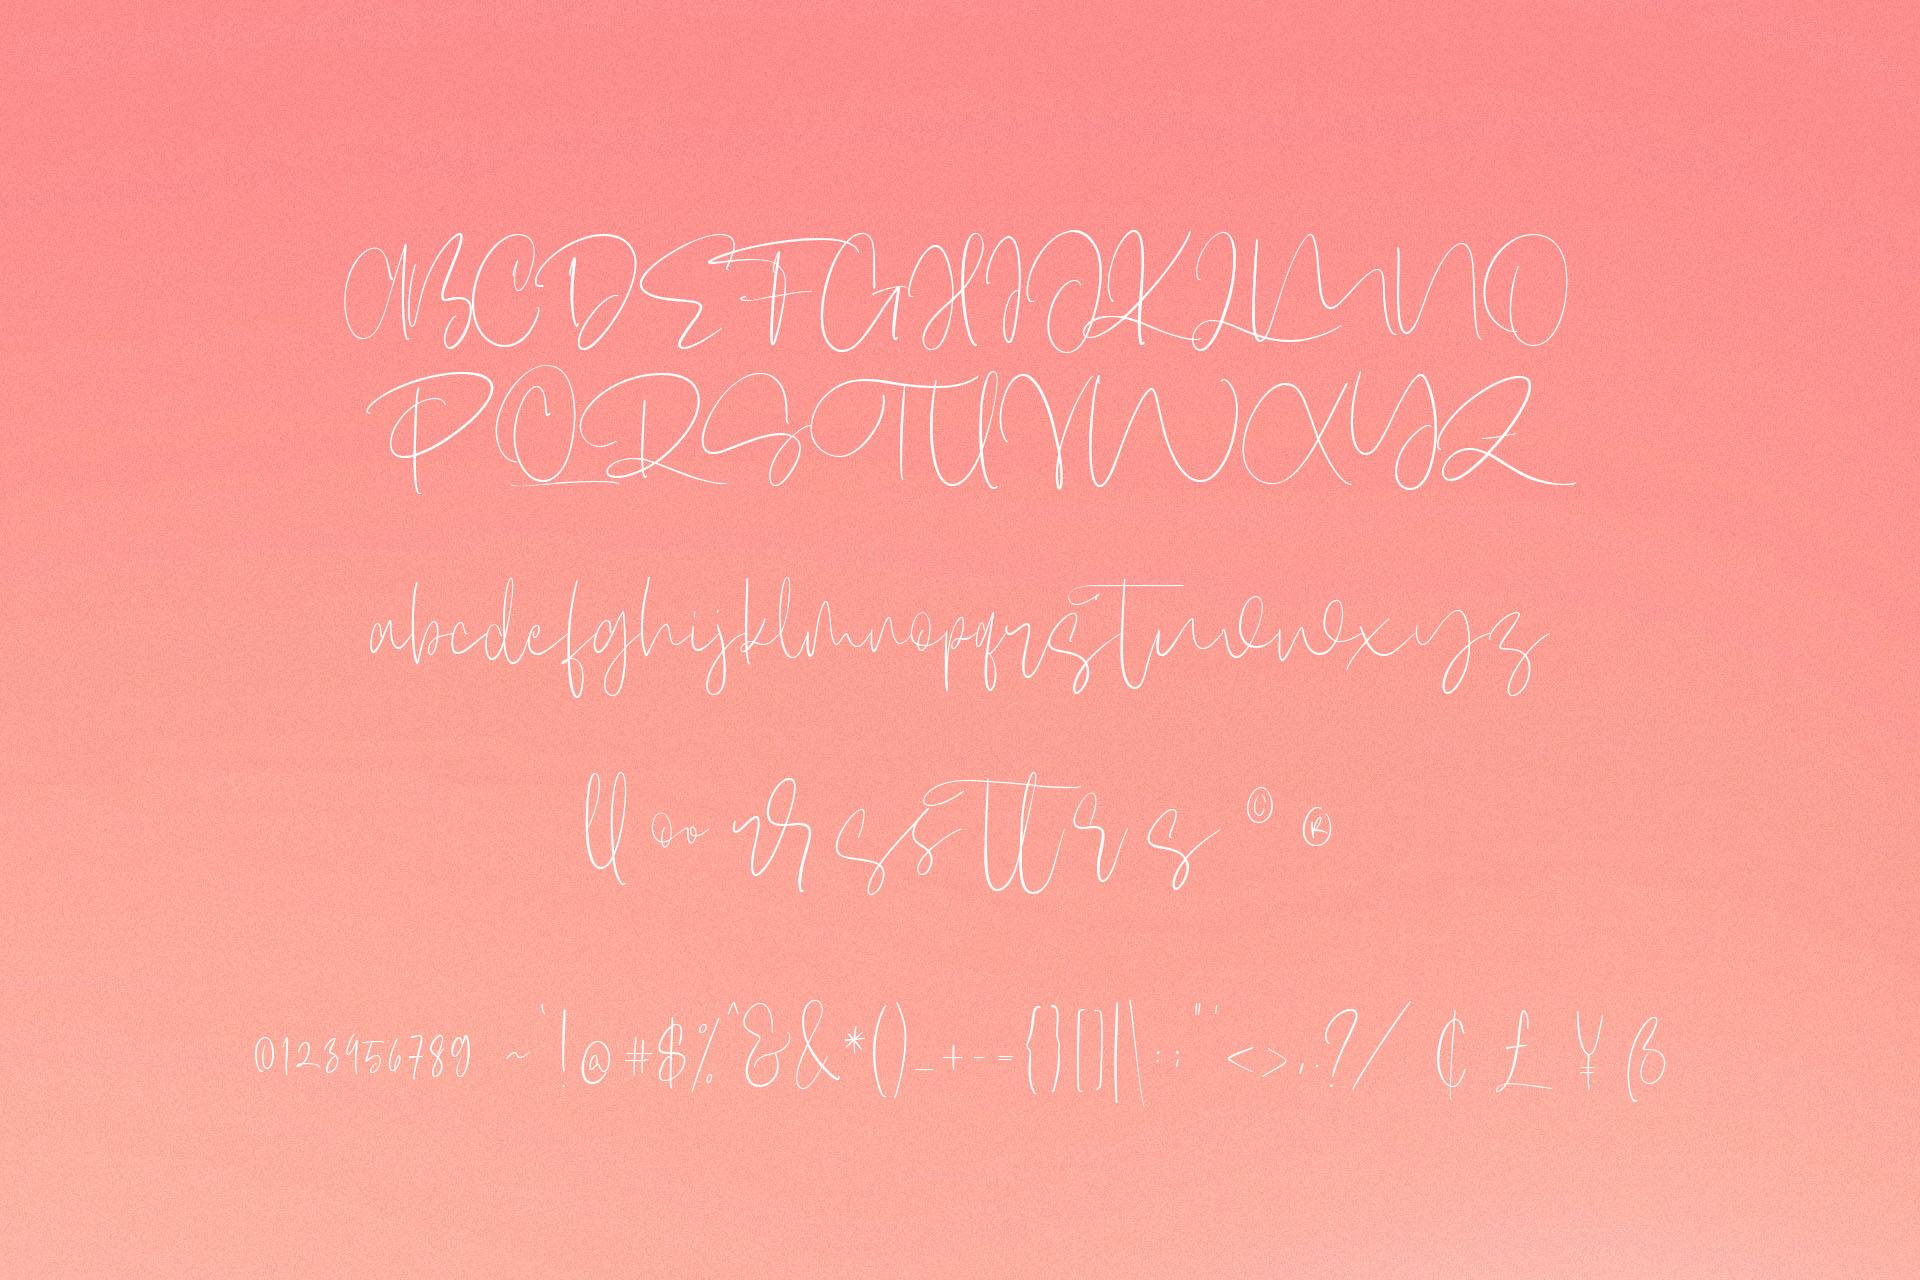 Claristta - Handwritten Brush Font example image 8